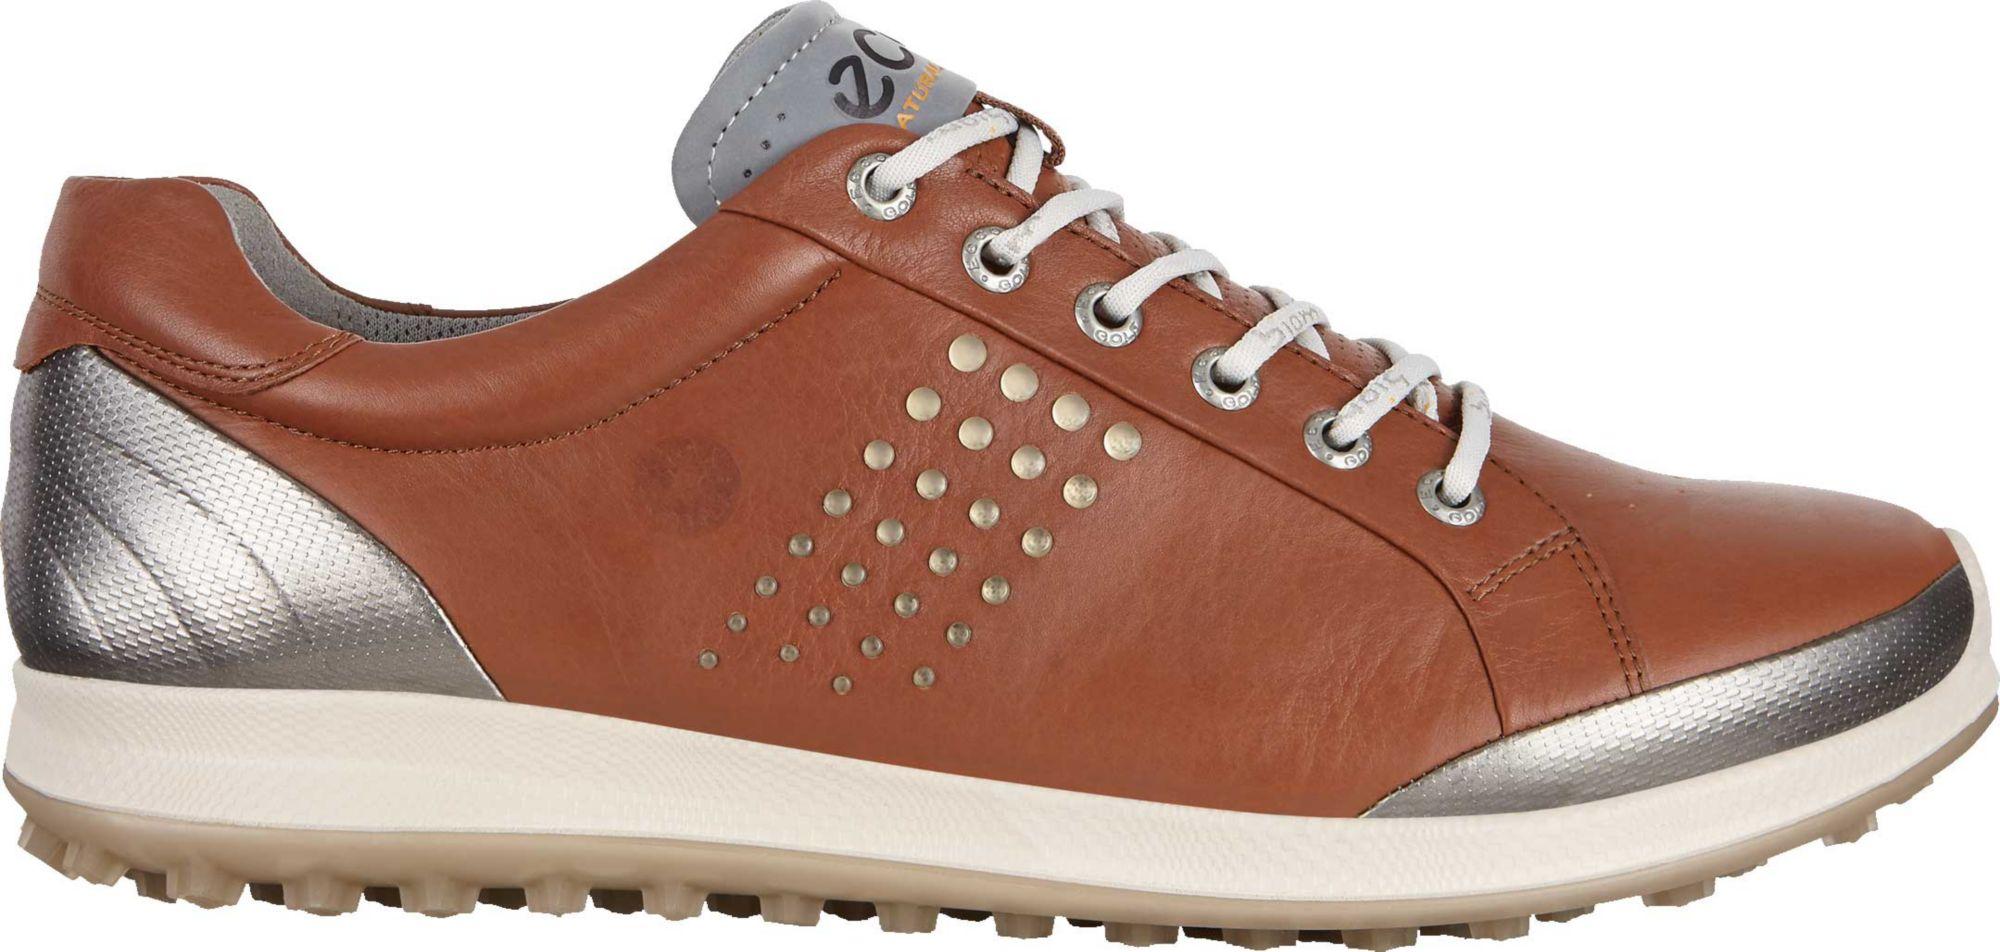 ECCO BIOM Hybrid 2 Spikeless Golf Shoes (Mahogany & White/Black) $109.98